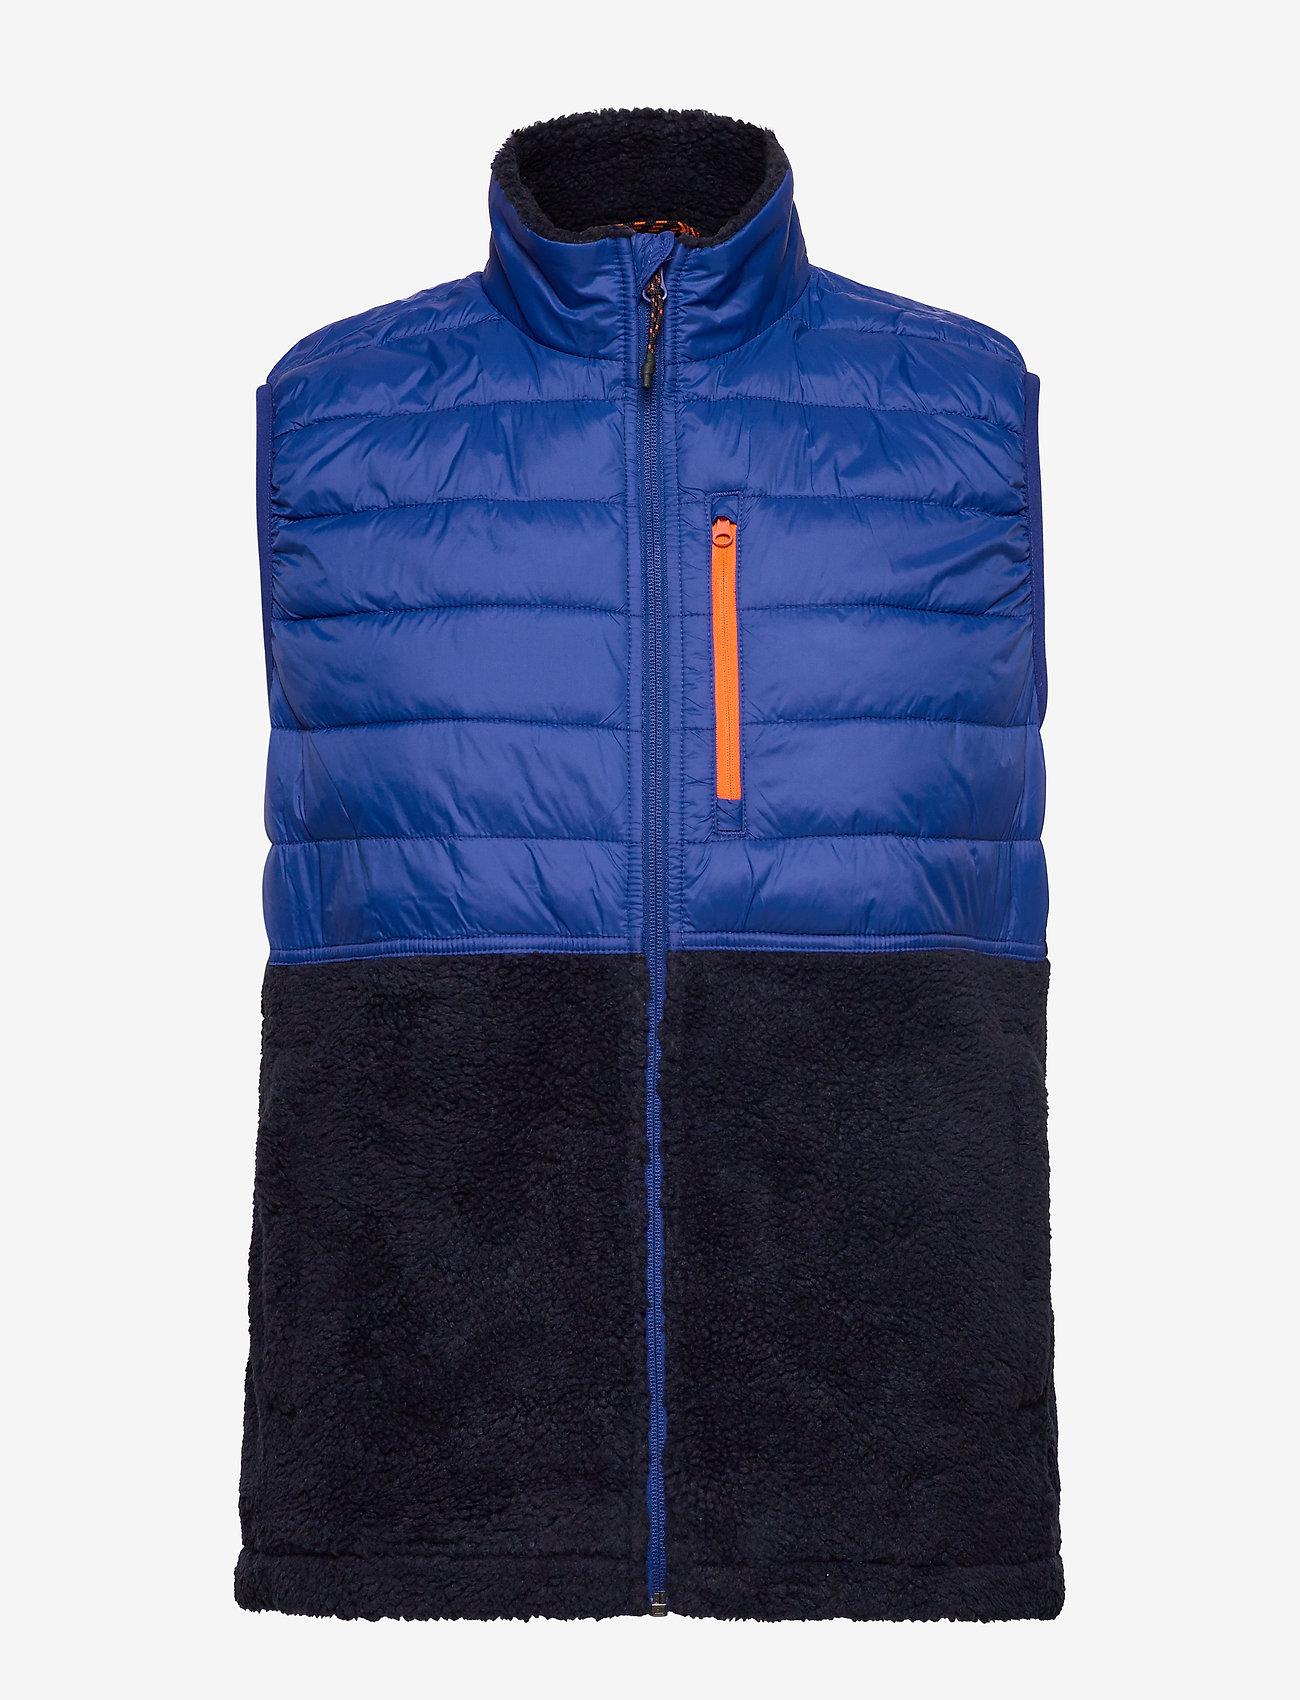 Gap Mix-fabric Sherpa Vest - Jackets & Coats